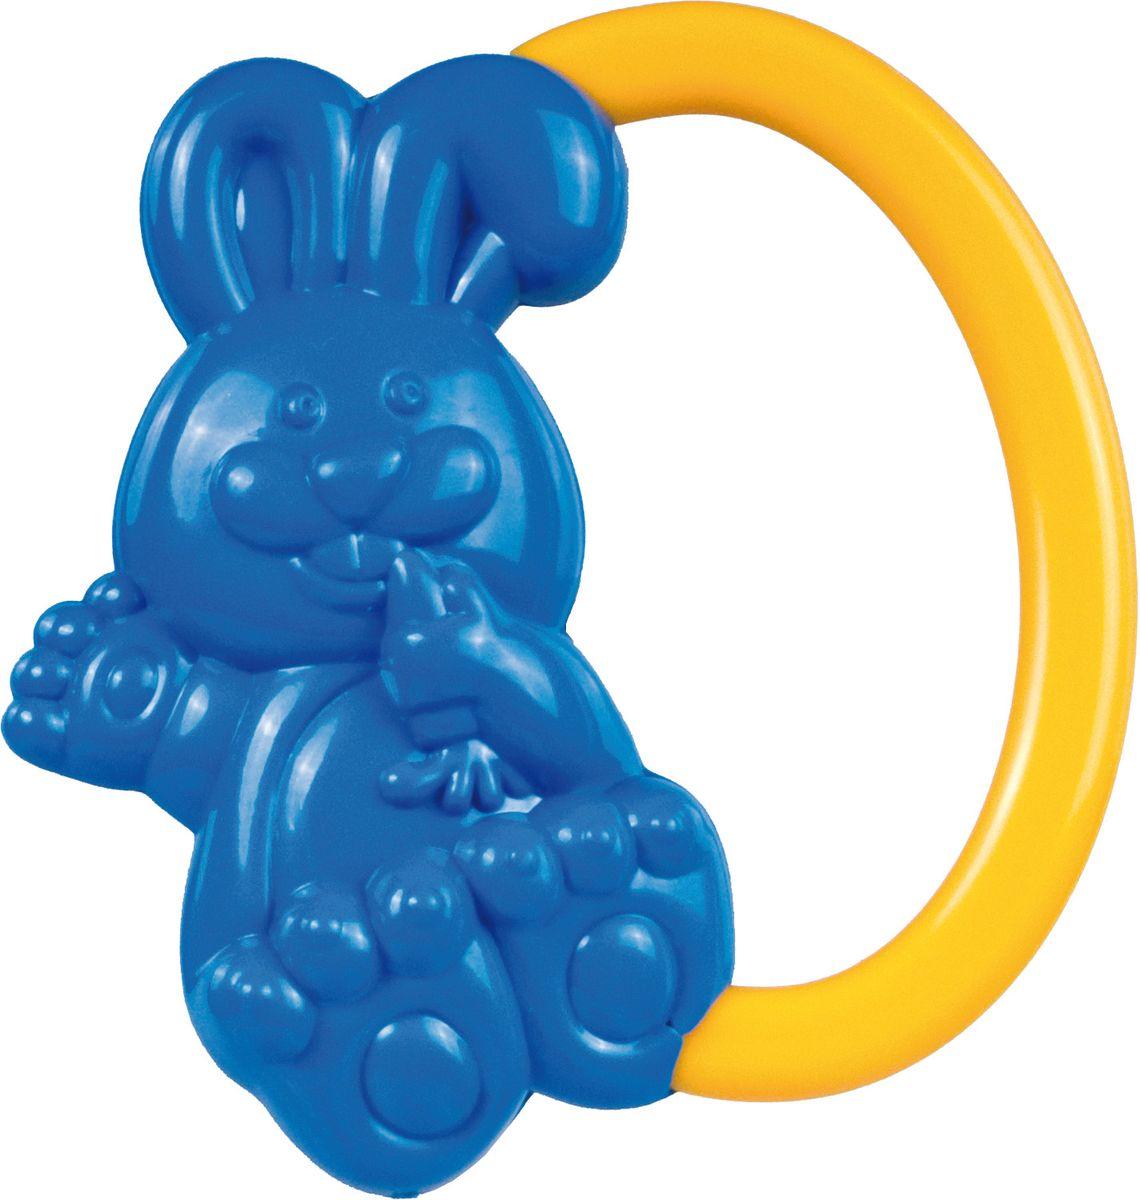 Canpol Babies Погремушка Кролик цвет синий canpol babies погремушка шарики жираф 0 canpol babies